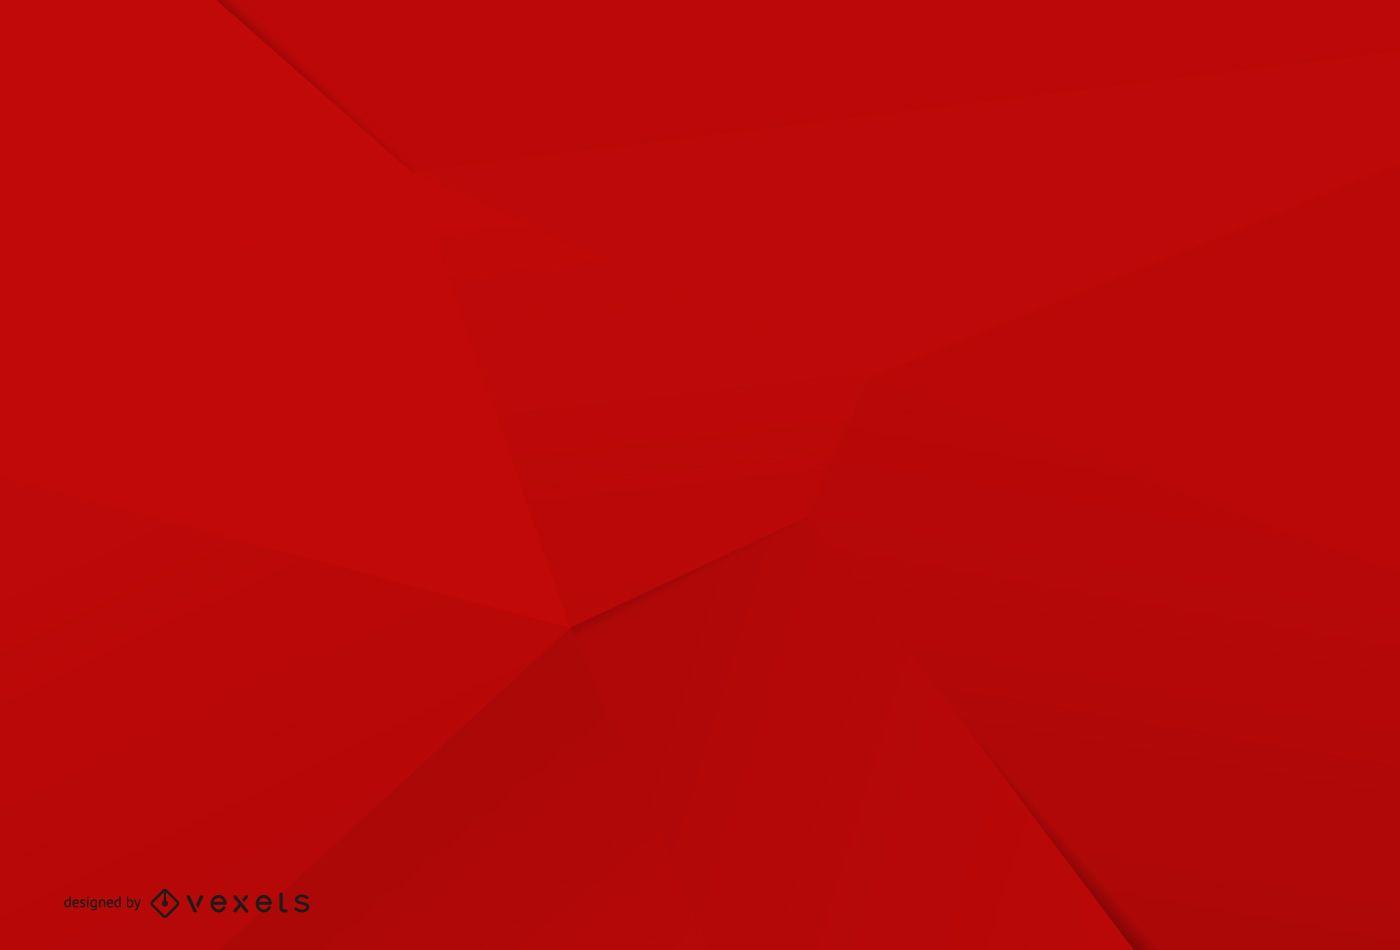 Projeto De Fundo Vermelho Minimalista Baixar Vector